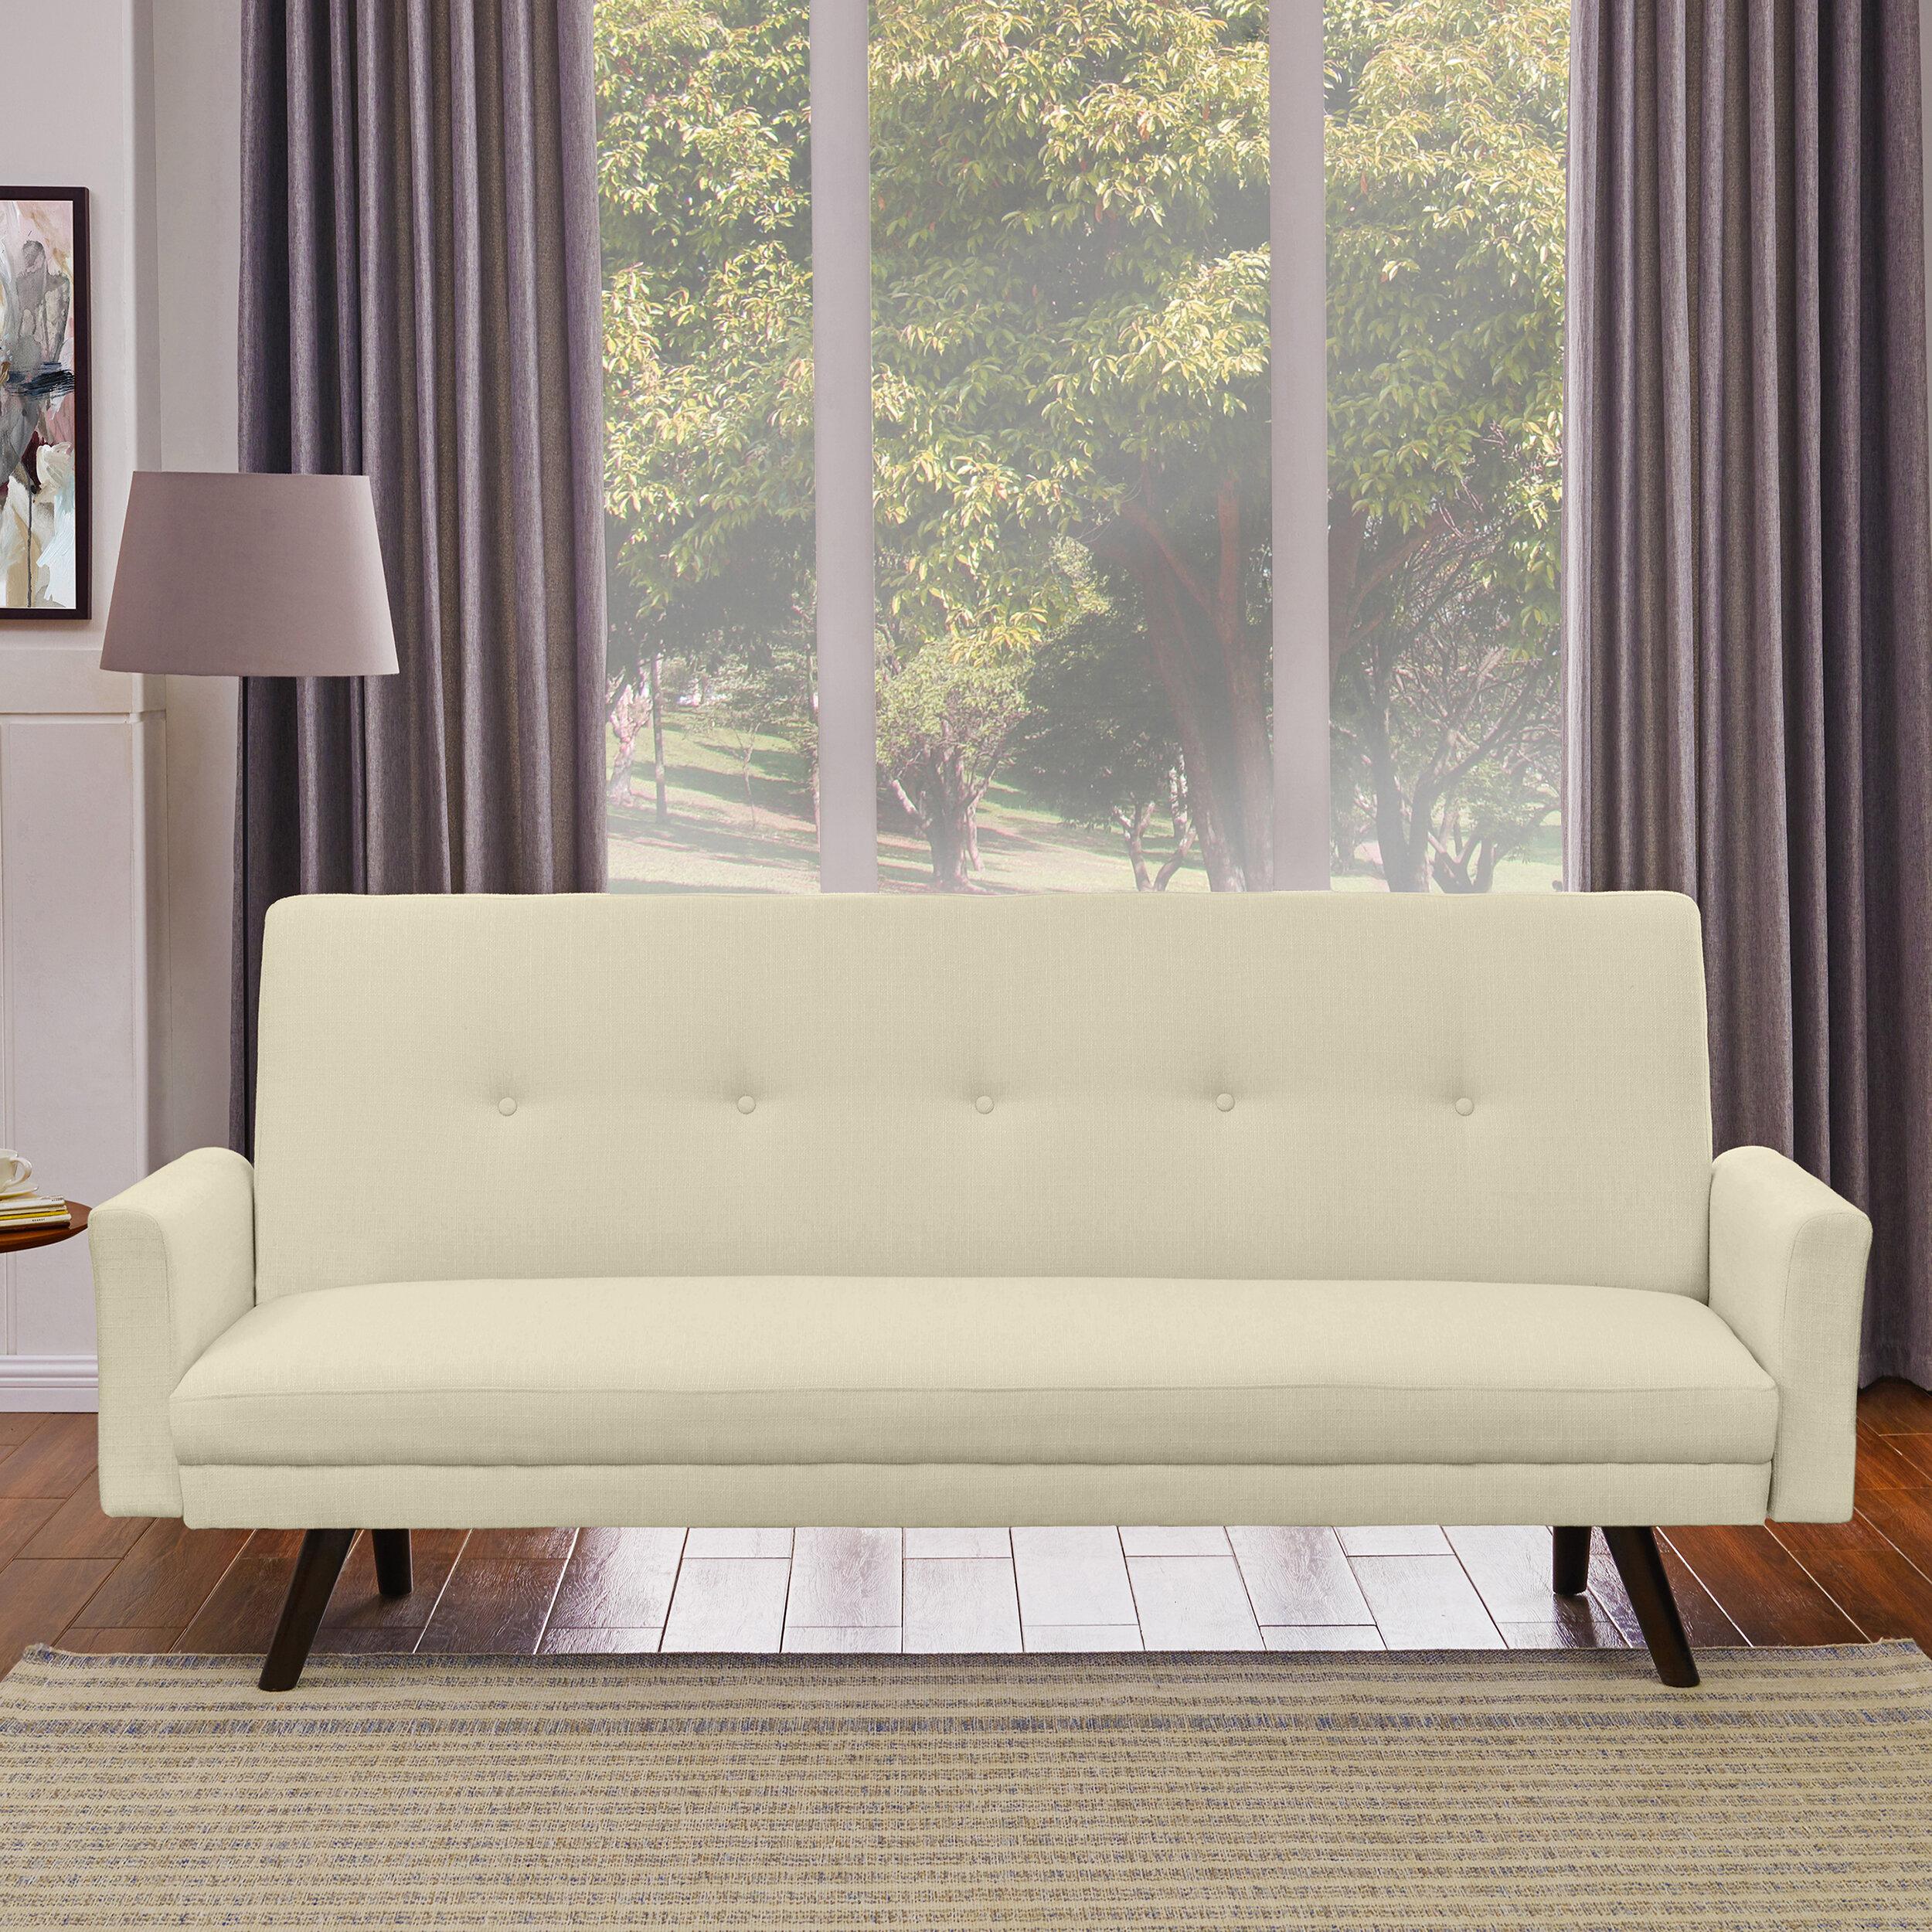 Westbrooks Click Clack Futon Convertible Sofa